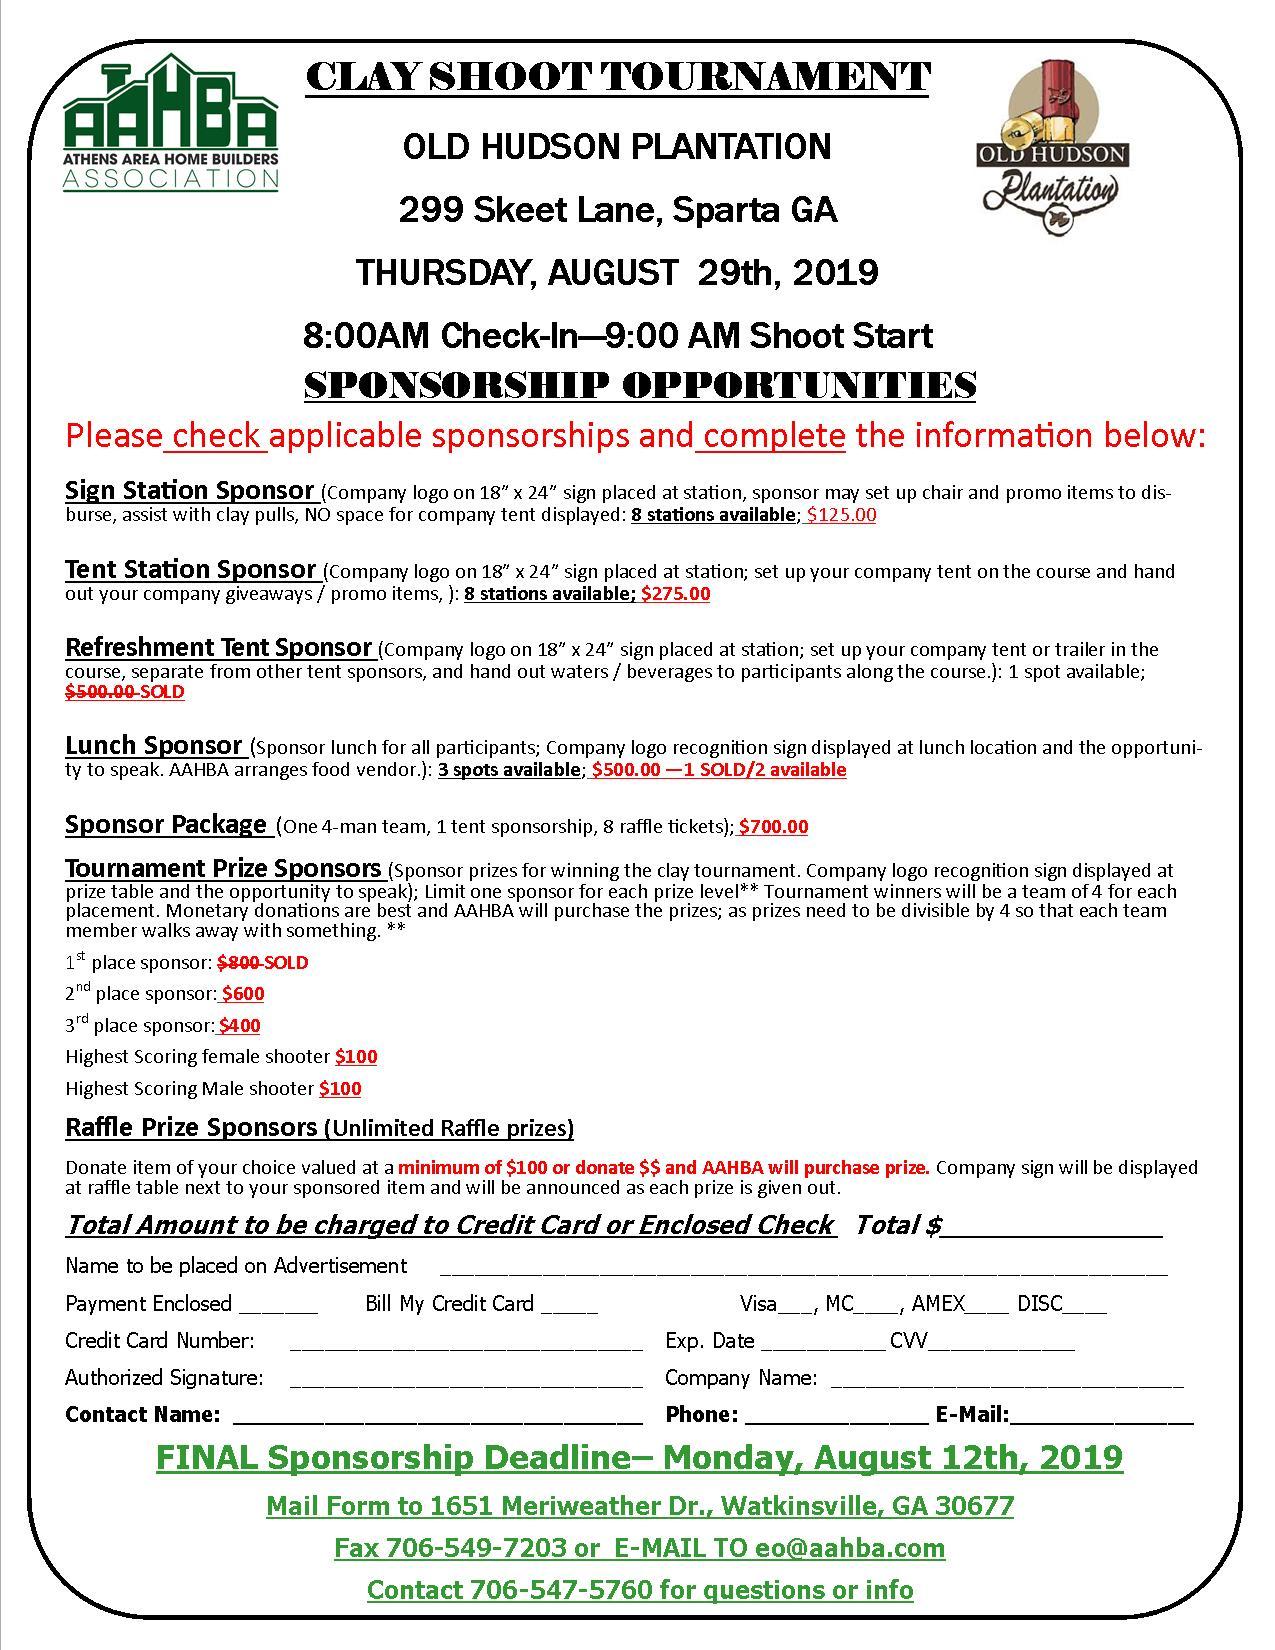 Sporting Clay Shoot Sponsorships Form